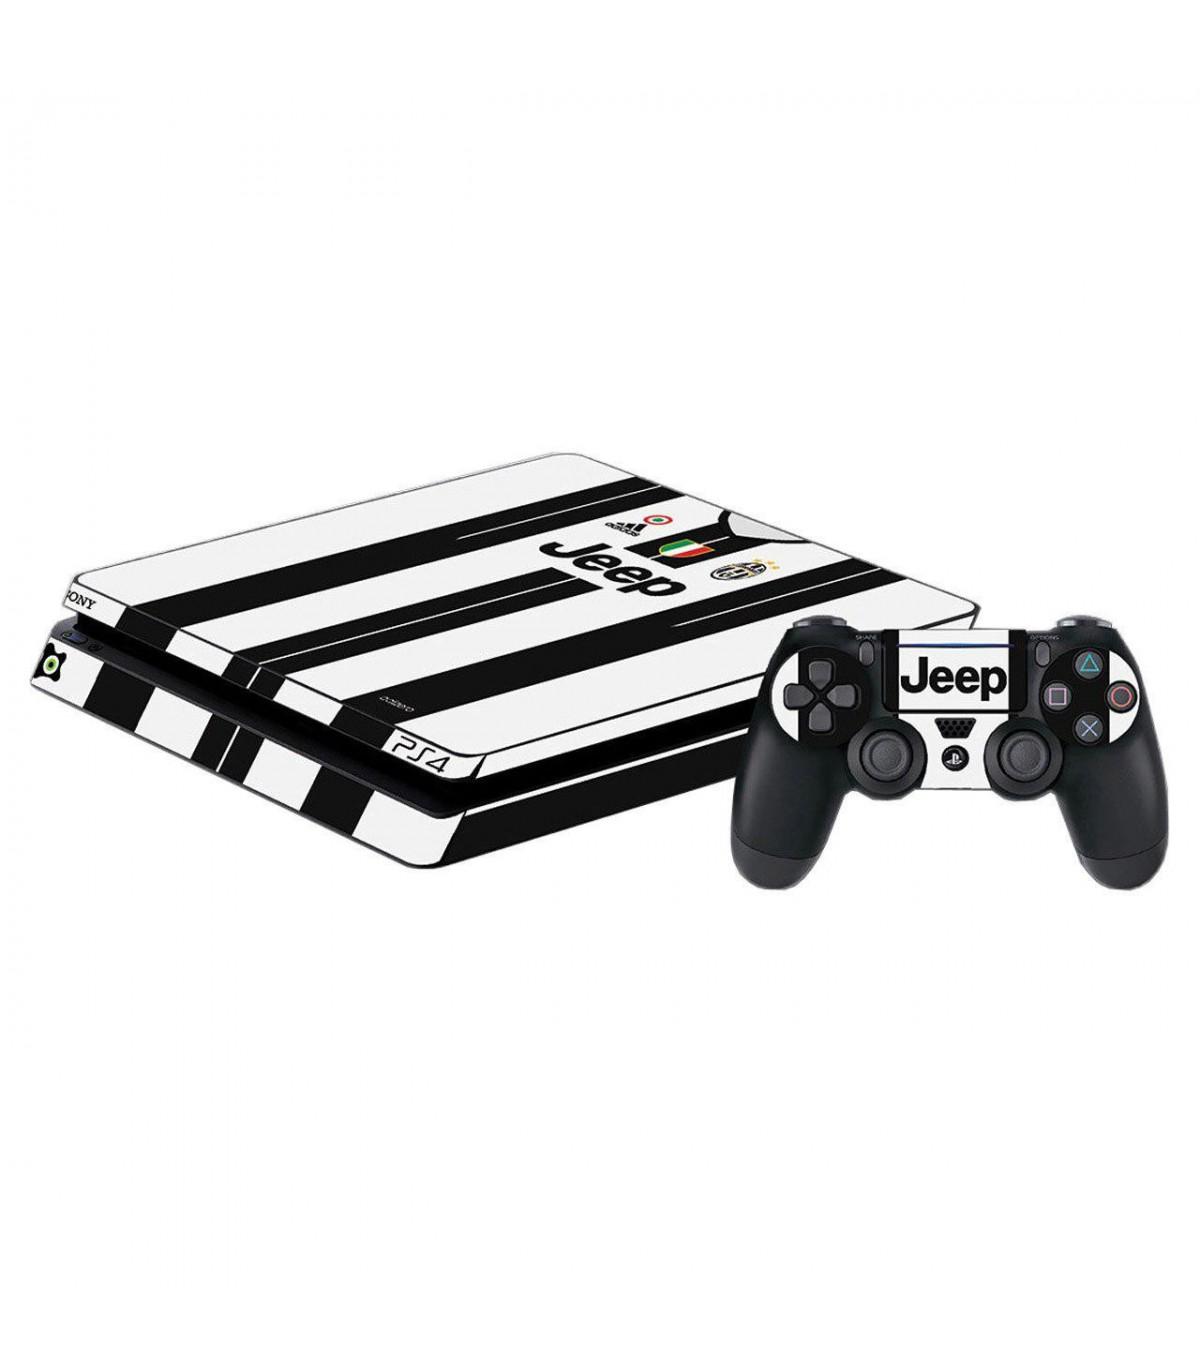 اسکین PS4 اسلیم طرح Juventus